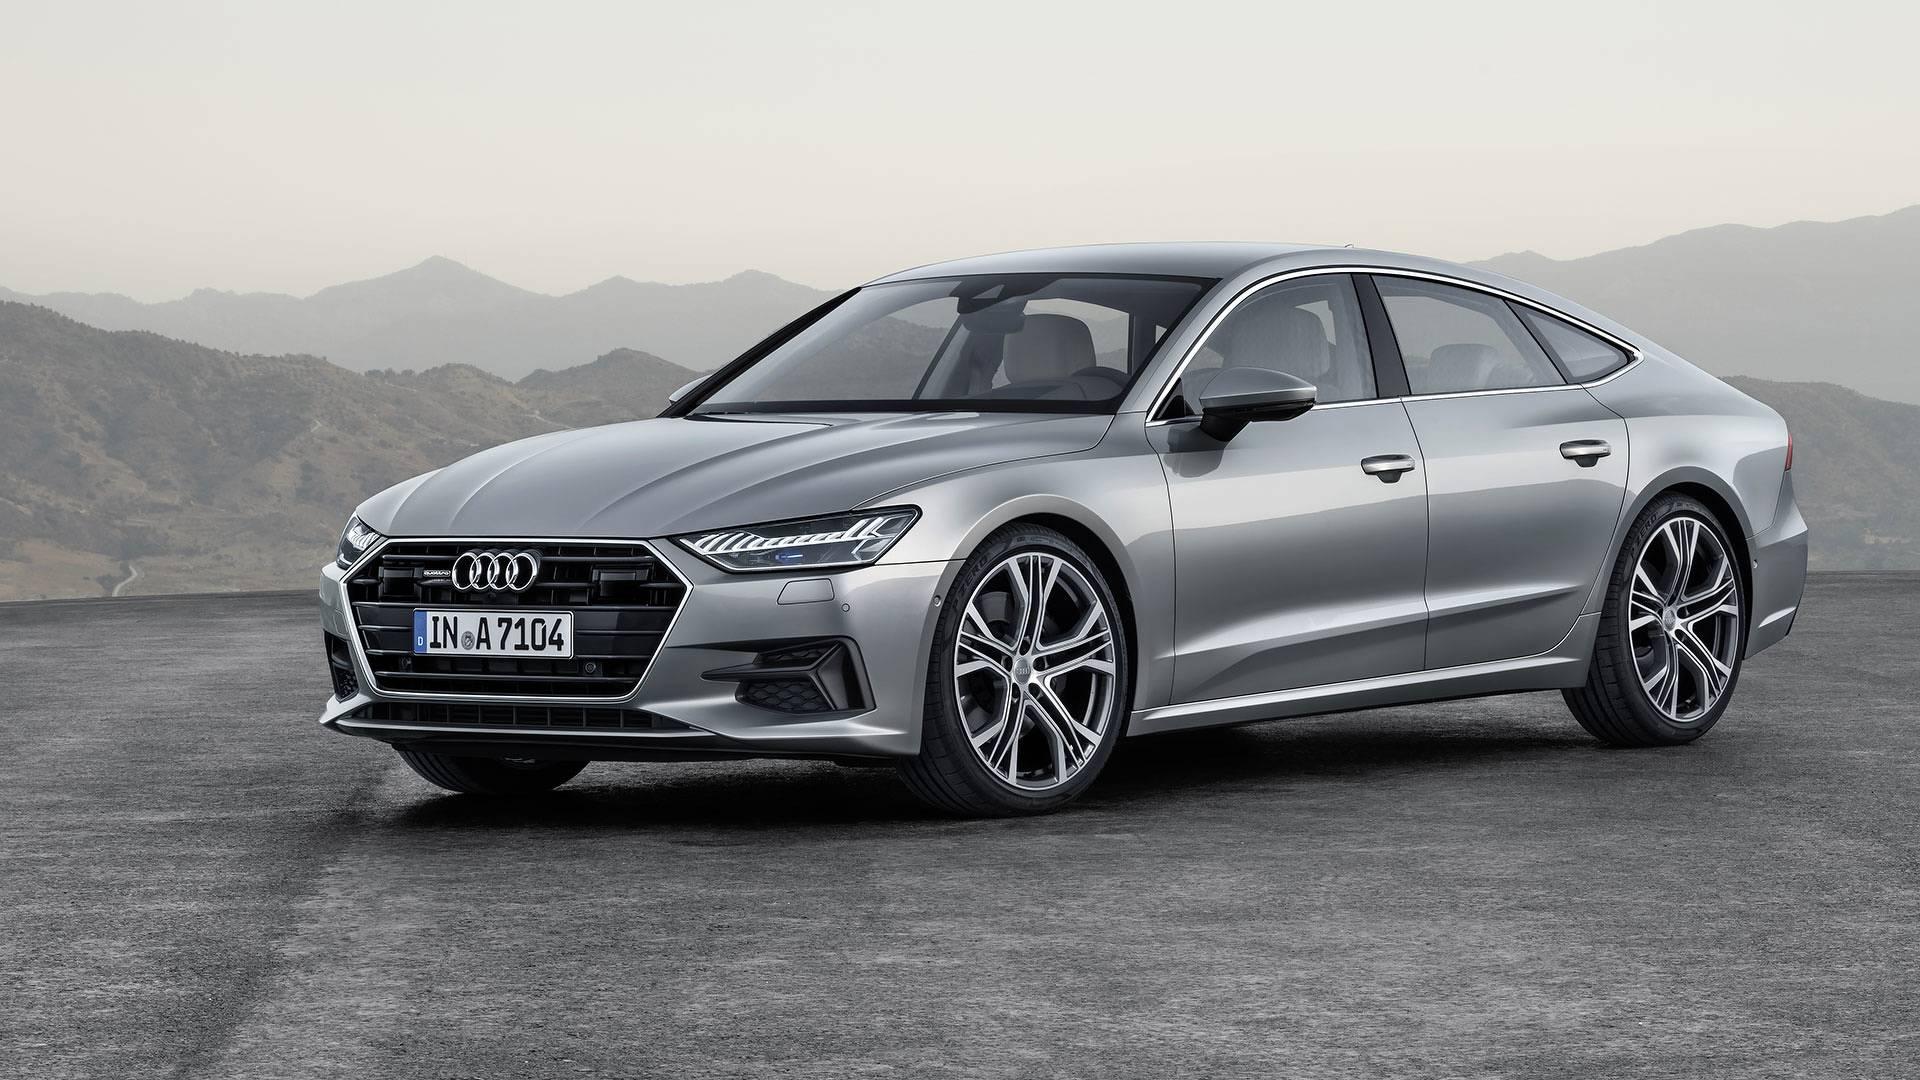 NOVO Audi A7 2018 Portugal